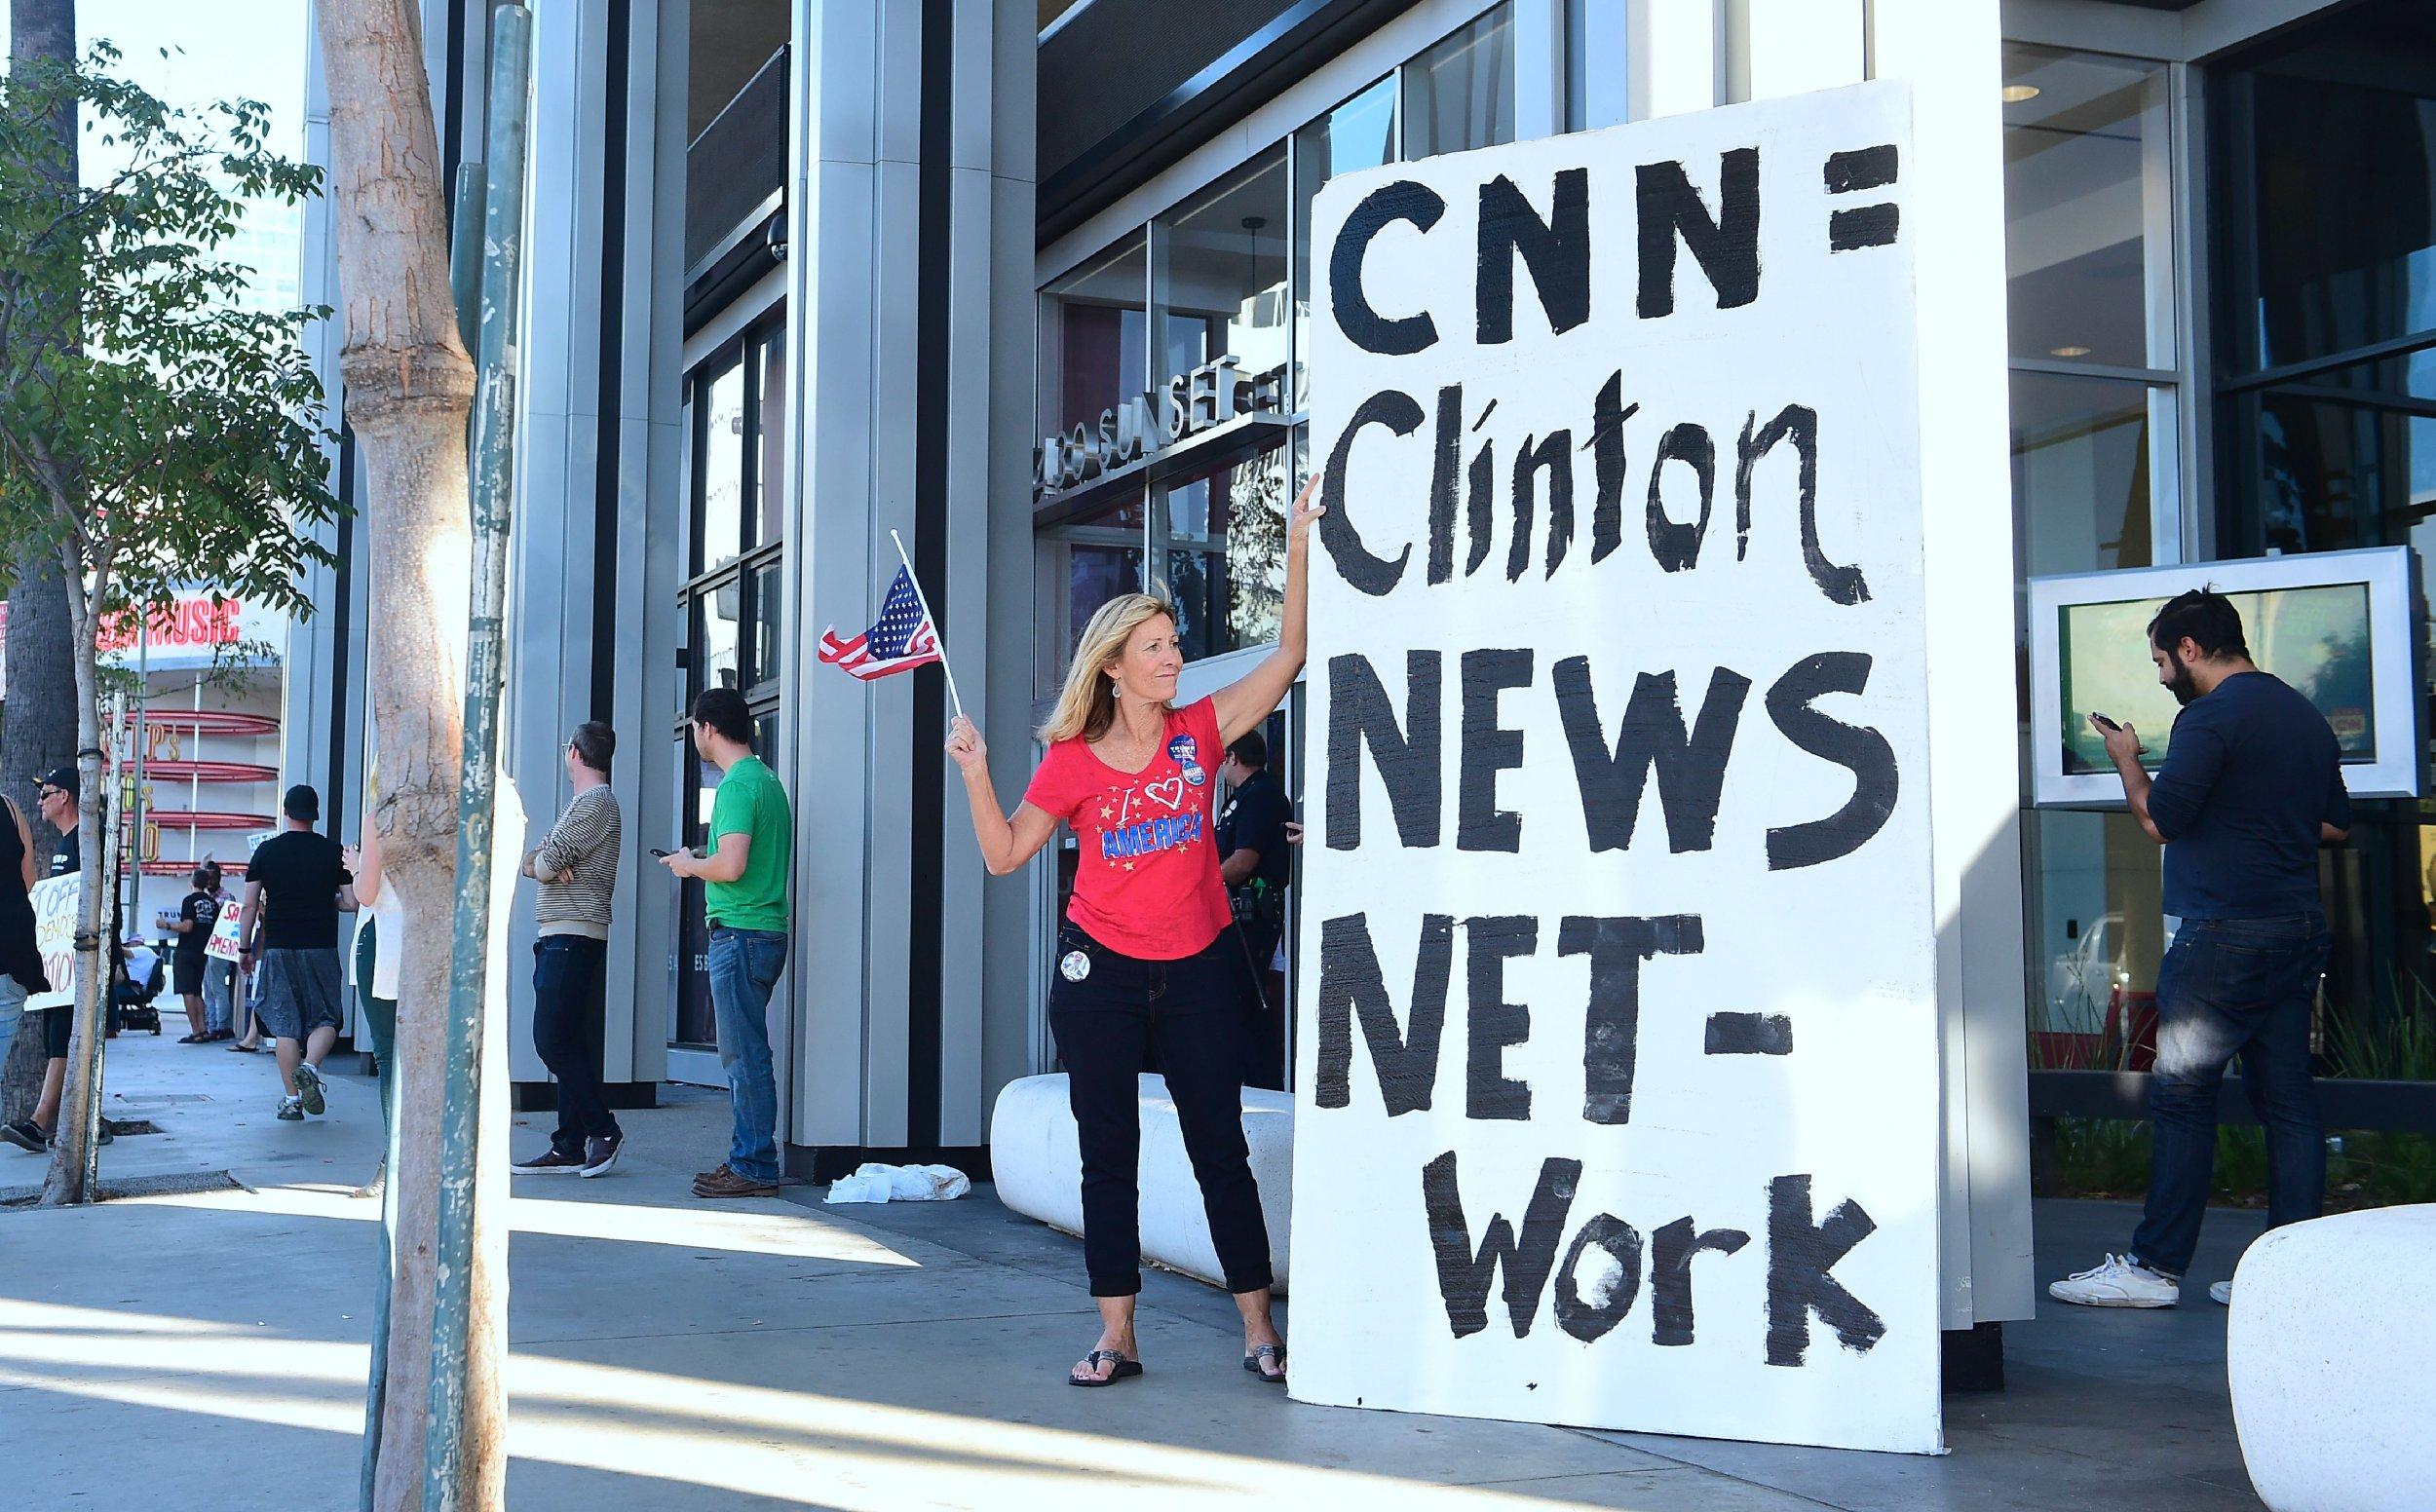 CNN_Man_Threatens_Kill_Employees